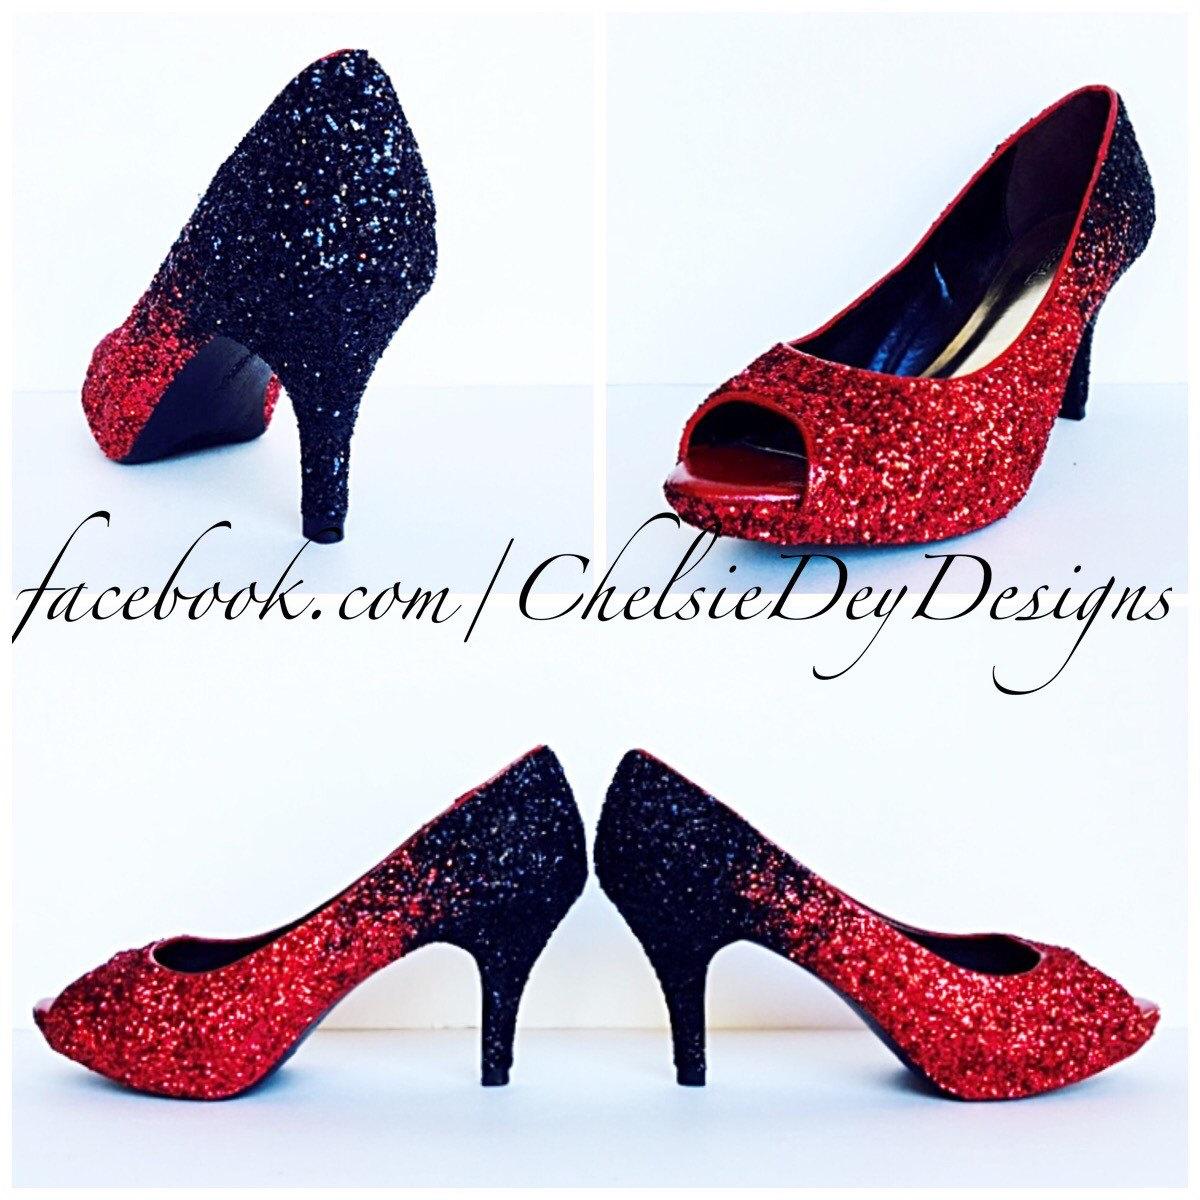 44f86b4cda6b Glitter High Heels, Black Red Pumps, Ombre Peep Toe Heels, Sparkly Wedding  Shoes